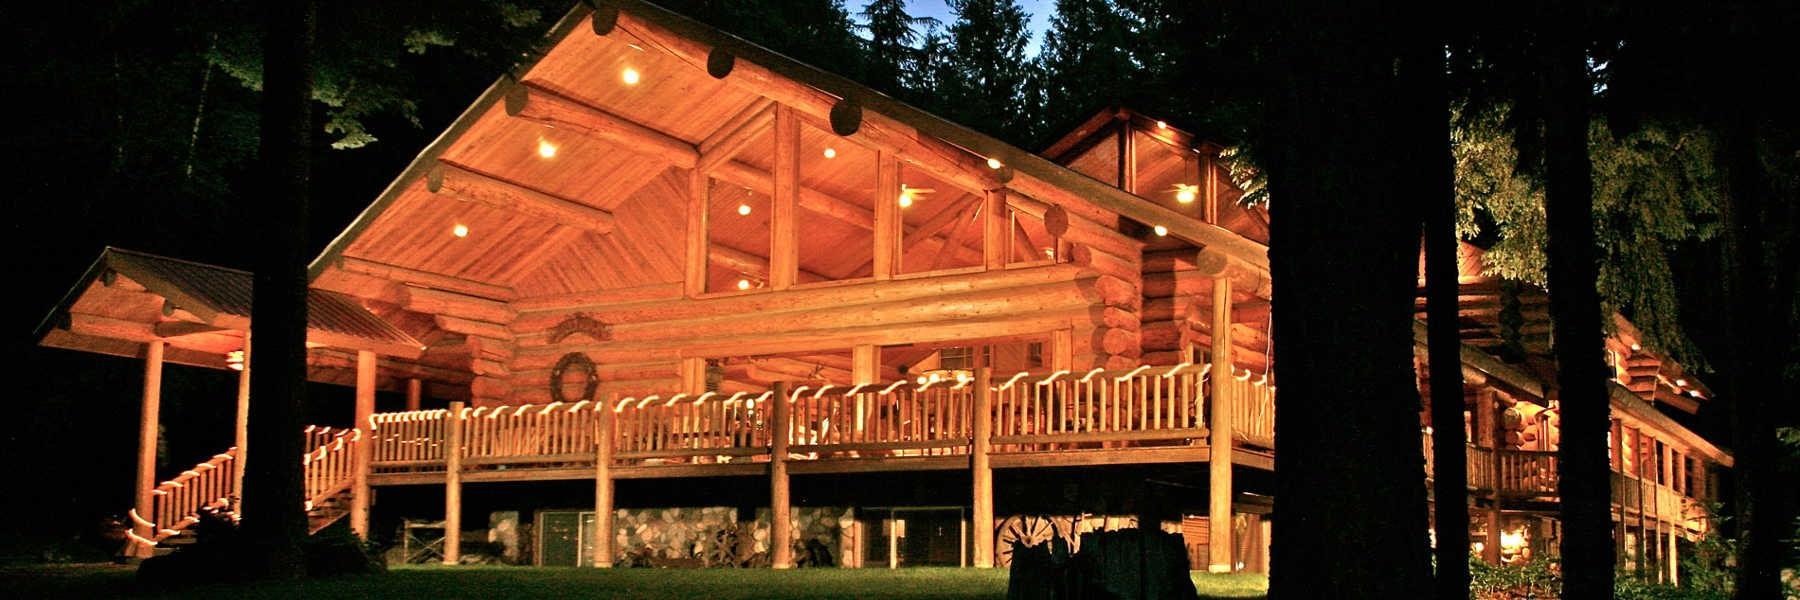 large log Lodge lit by lights at night